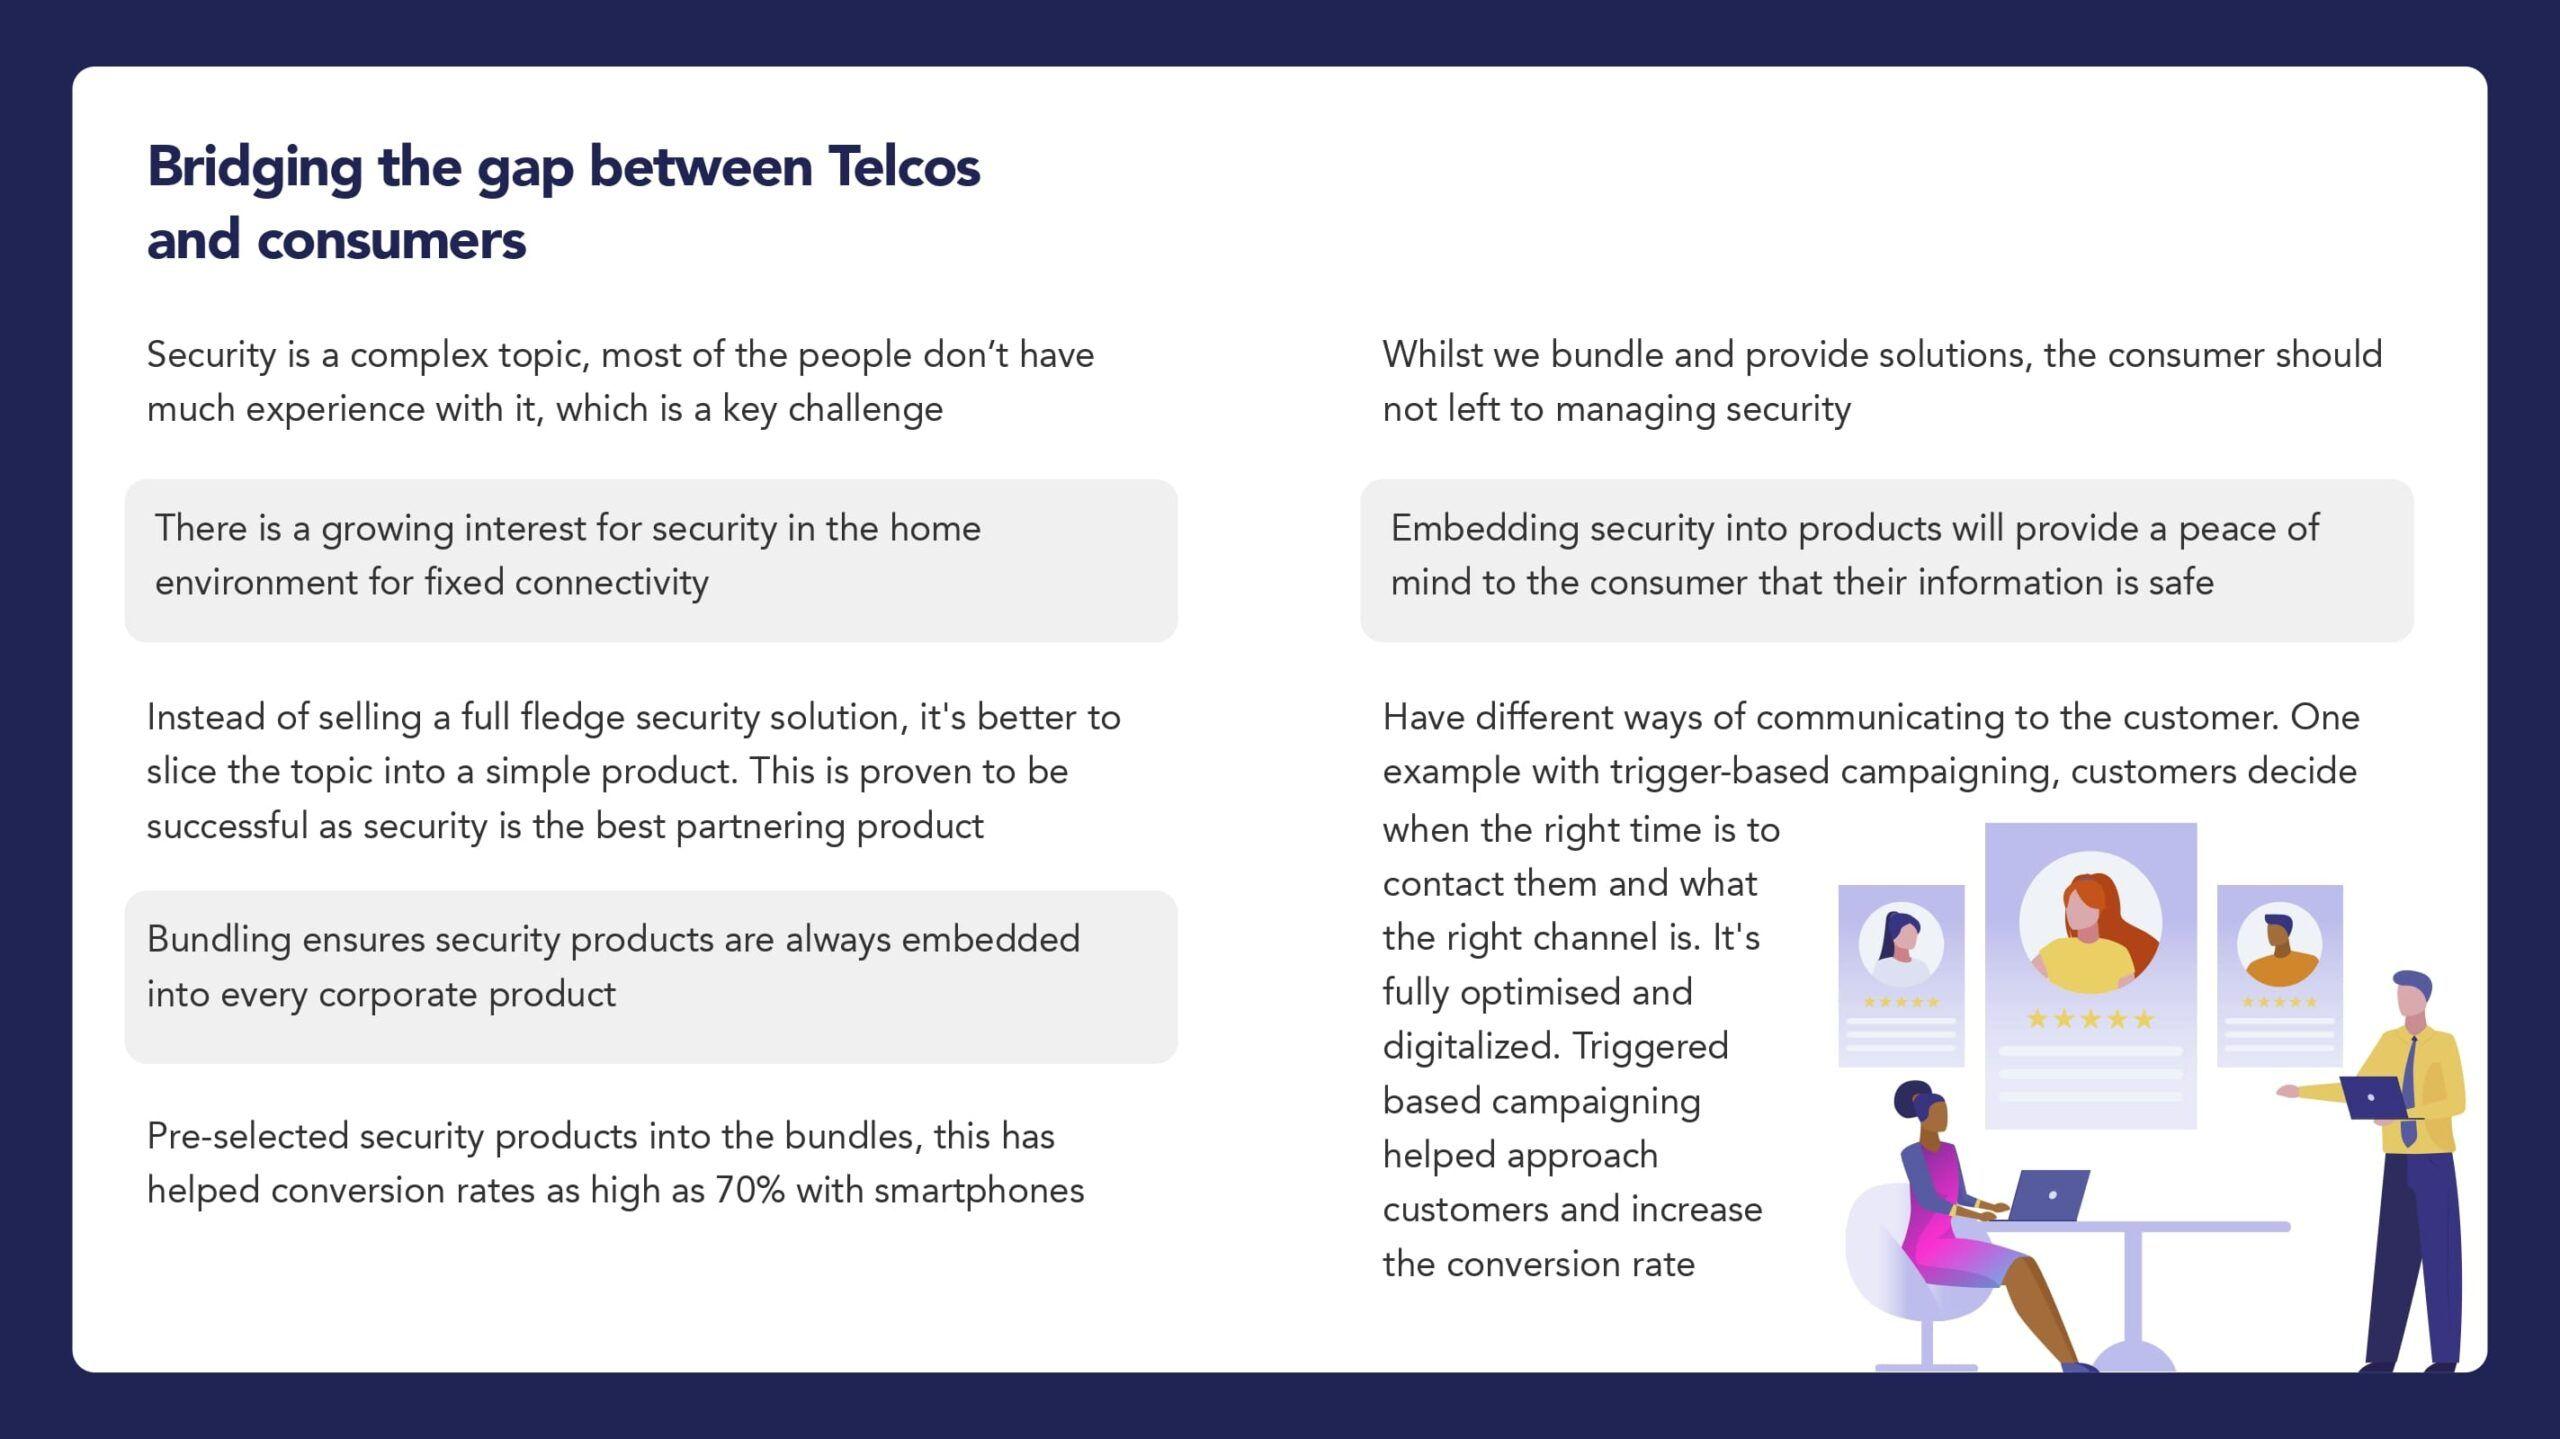 security, telecos, telecoms,future, telecommunications, covid19, new normal, axiata, cyan, magenta, twimbit, europe, asia